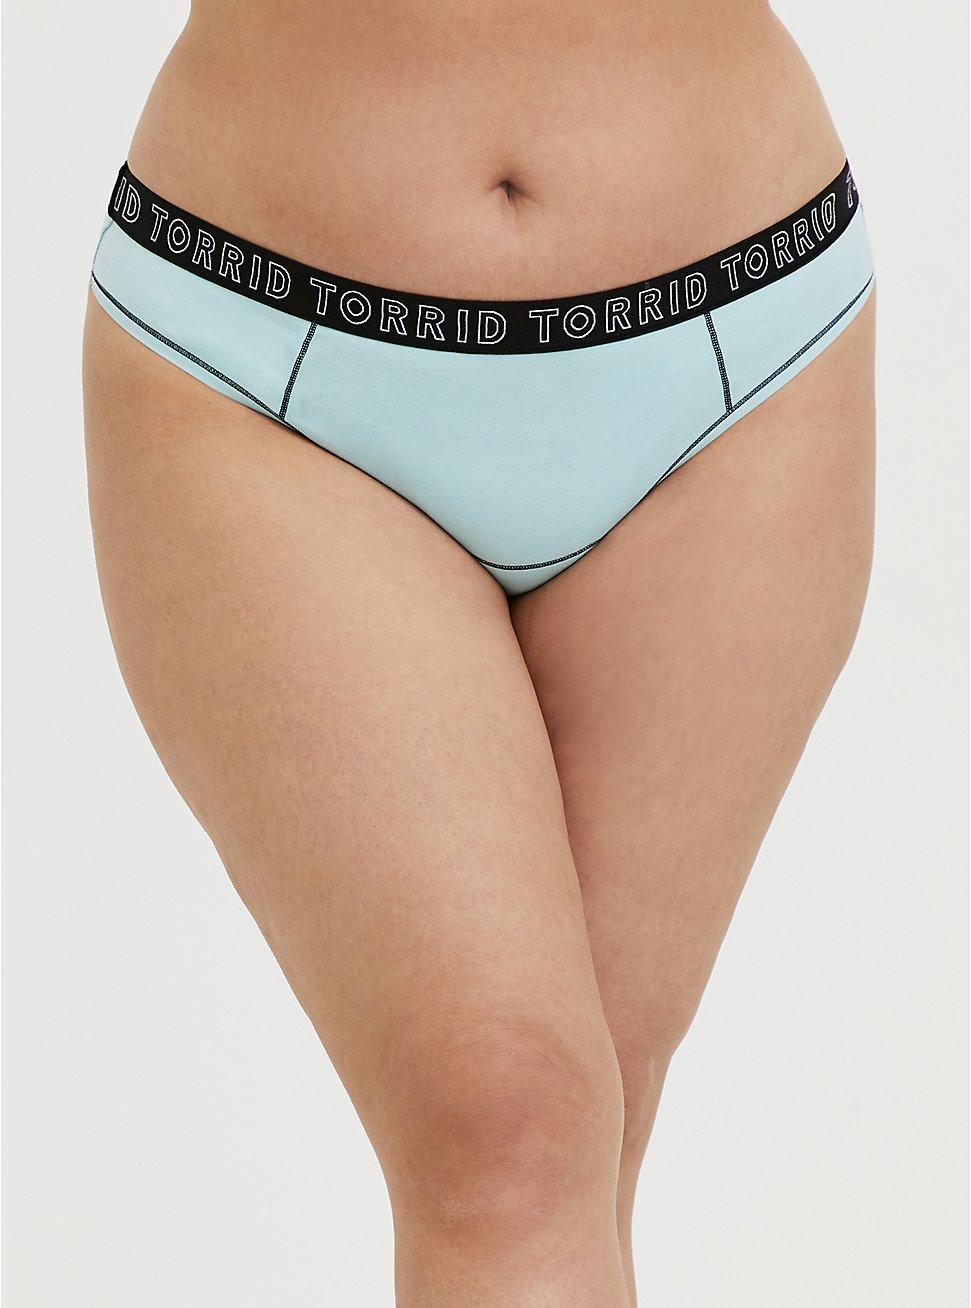 Plus Size Torrid Logo Aqua Cotton Thong Panty, CLEARWATER, hi-res